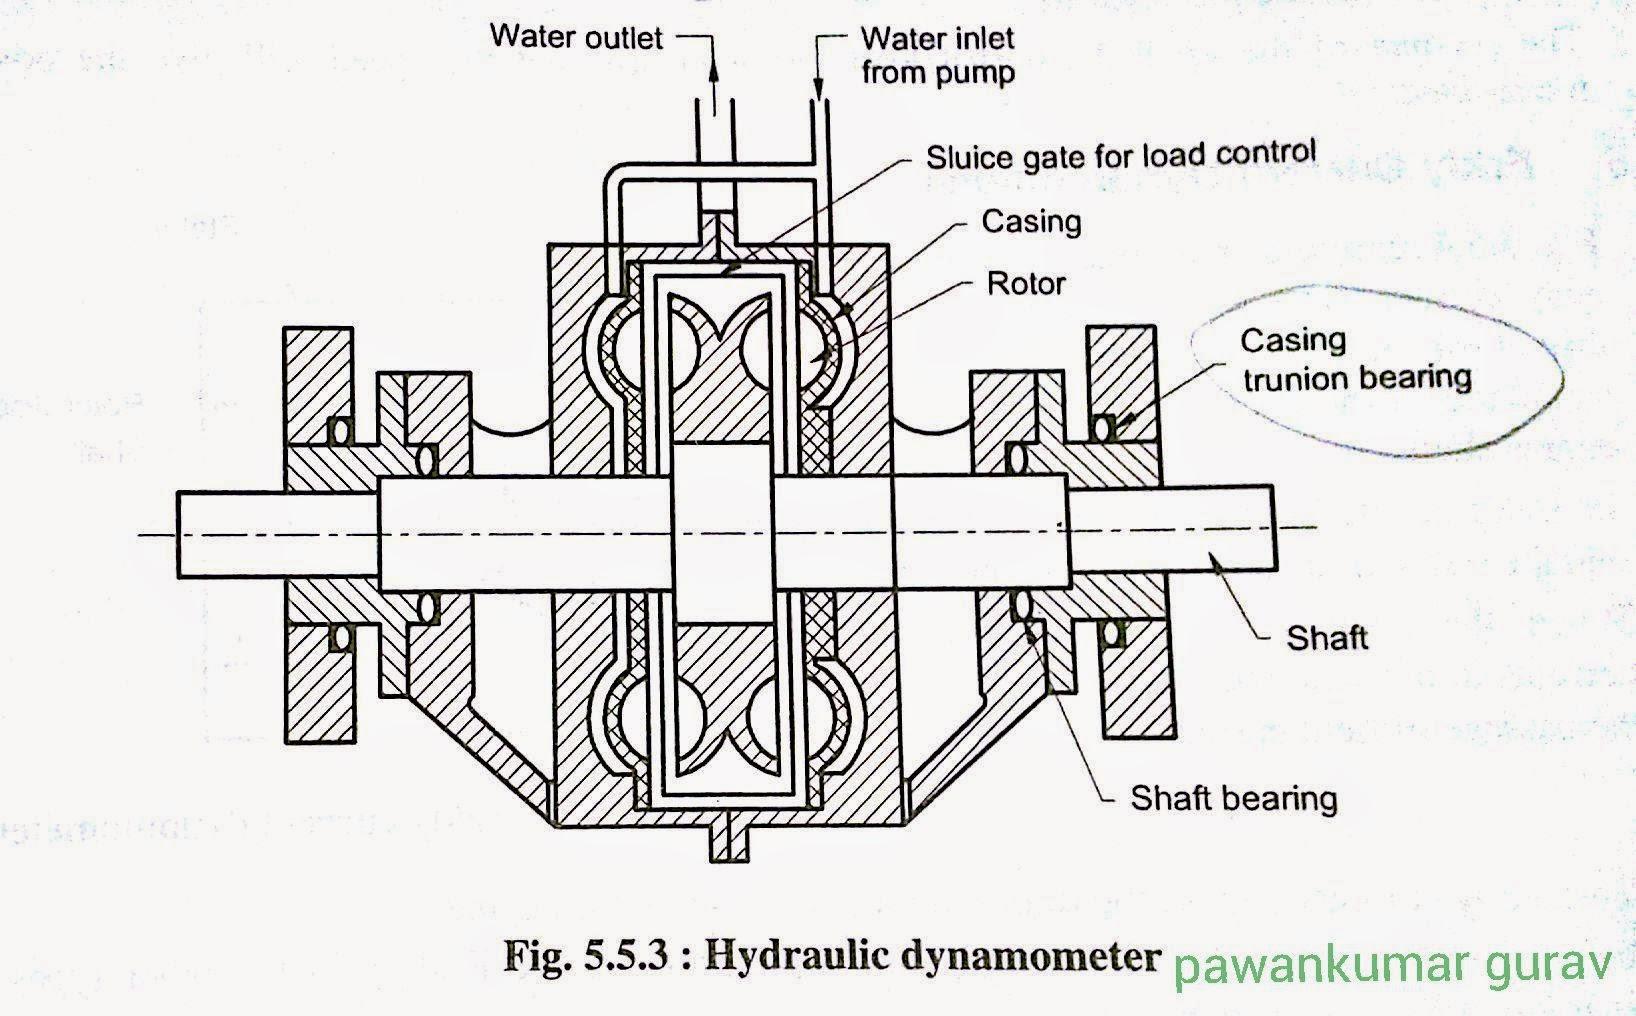 Parts Of A Dynamometer : Hydraulic dynamometer diagram pawankumar gurav